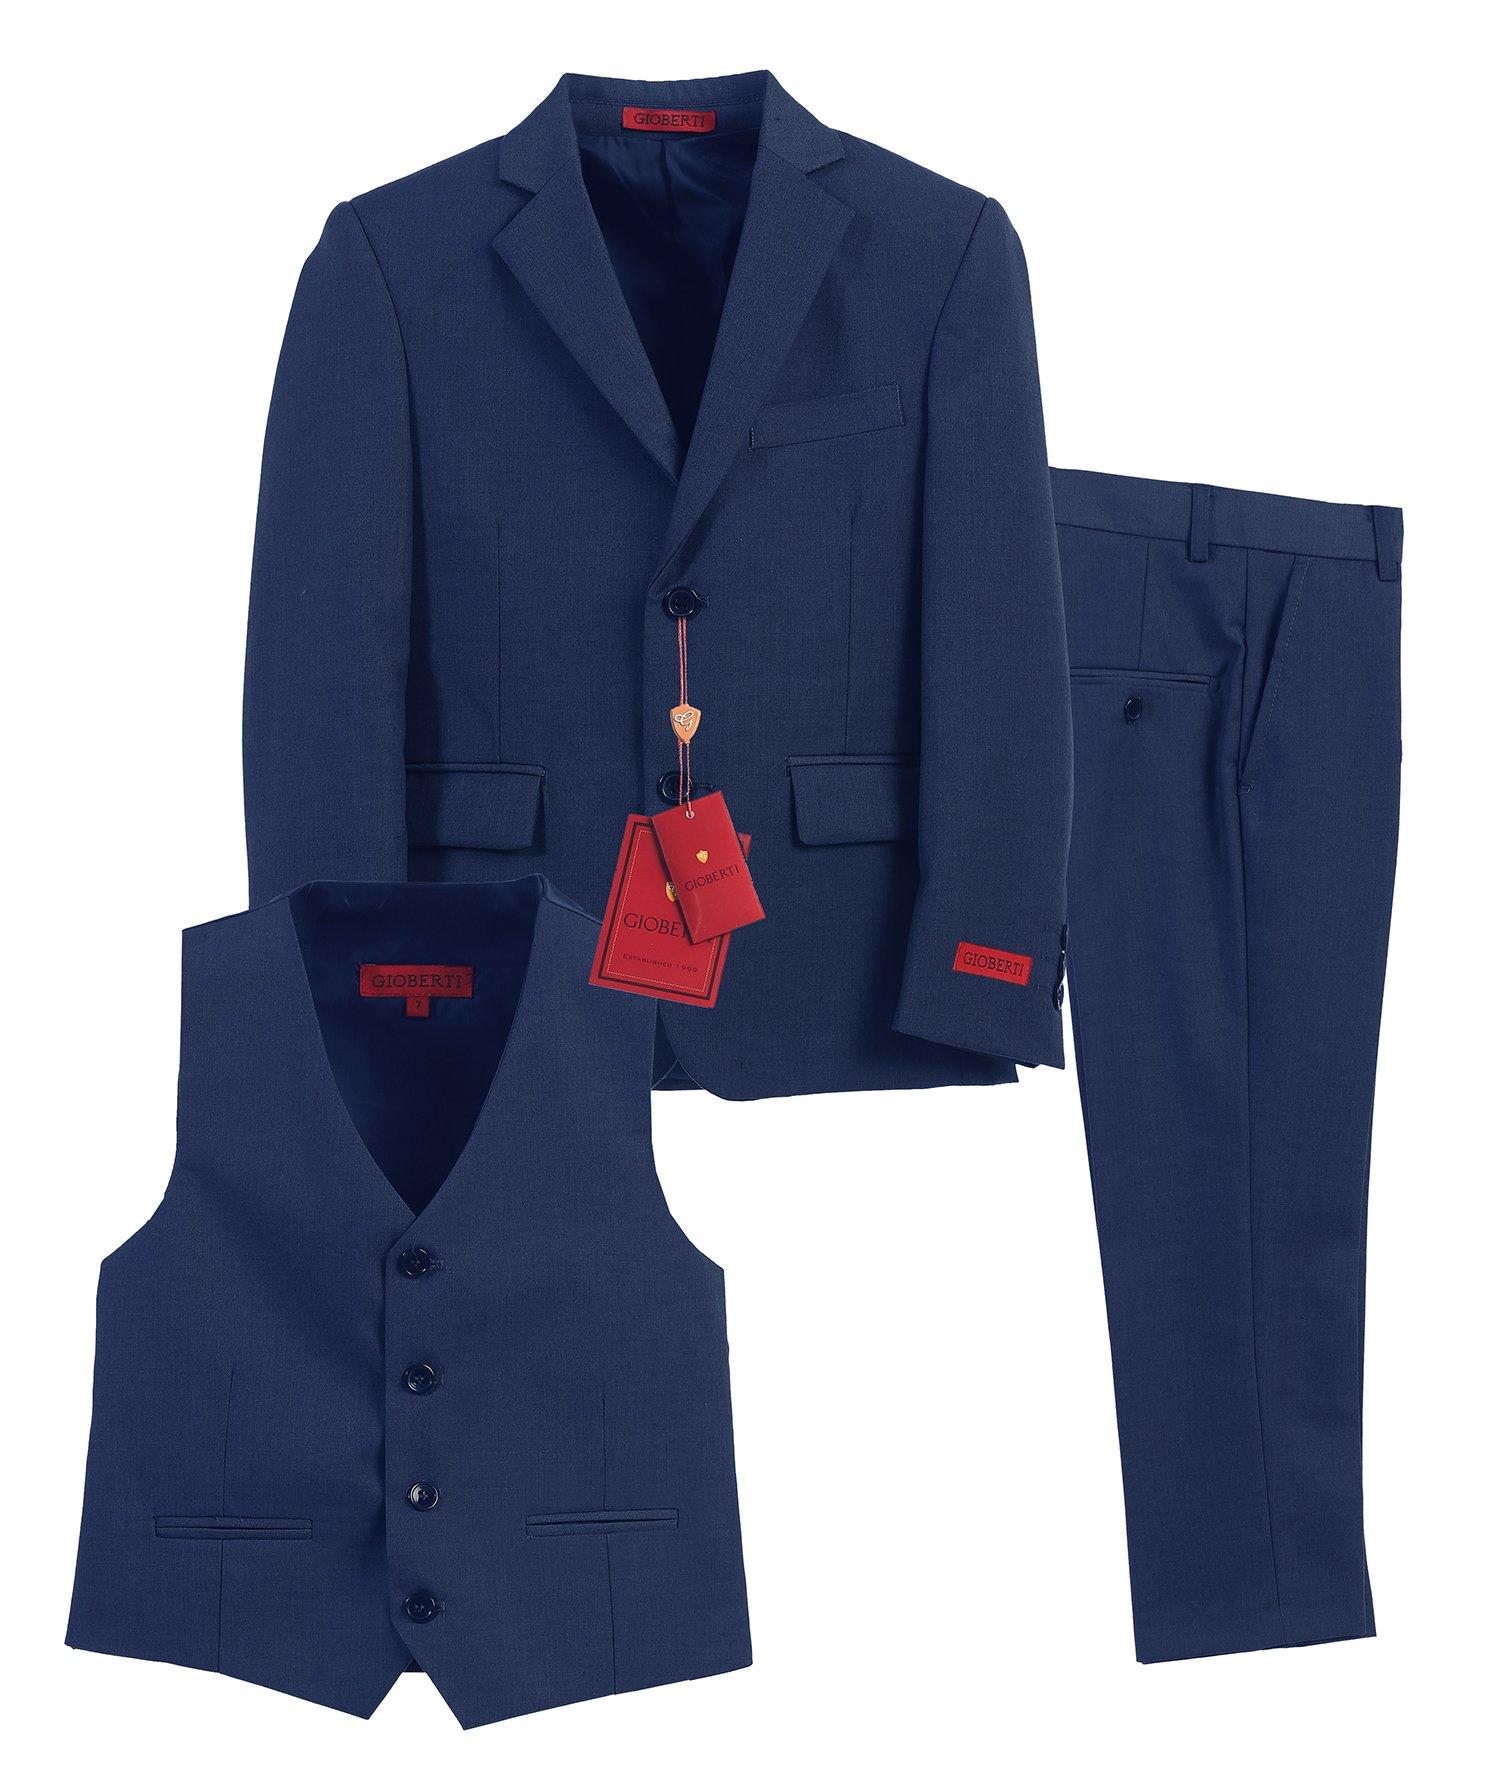 Gioberti Boy's Formal 3 Piece Suit Set, Royal Blue, Size 10